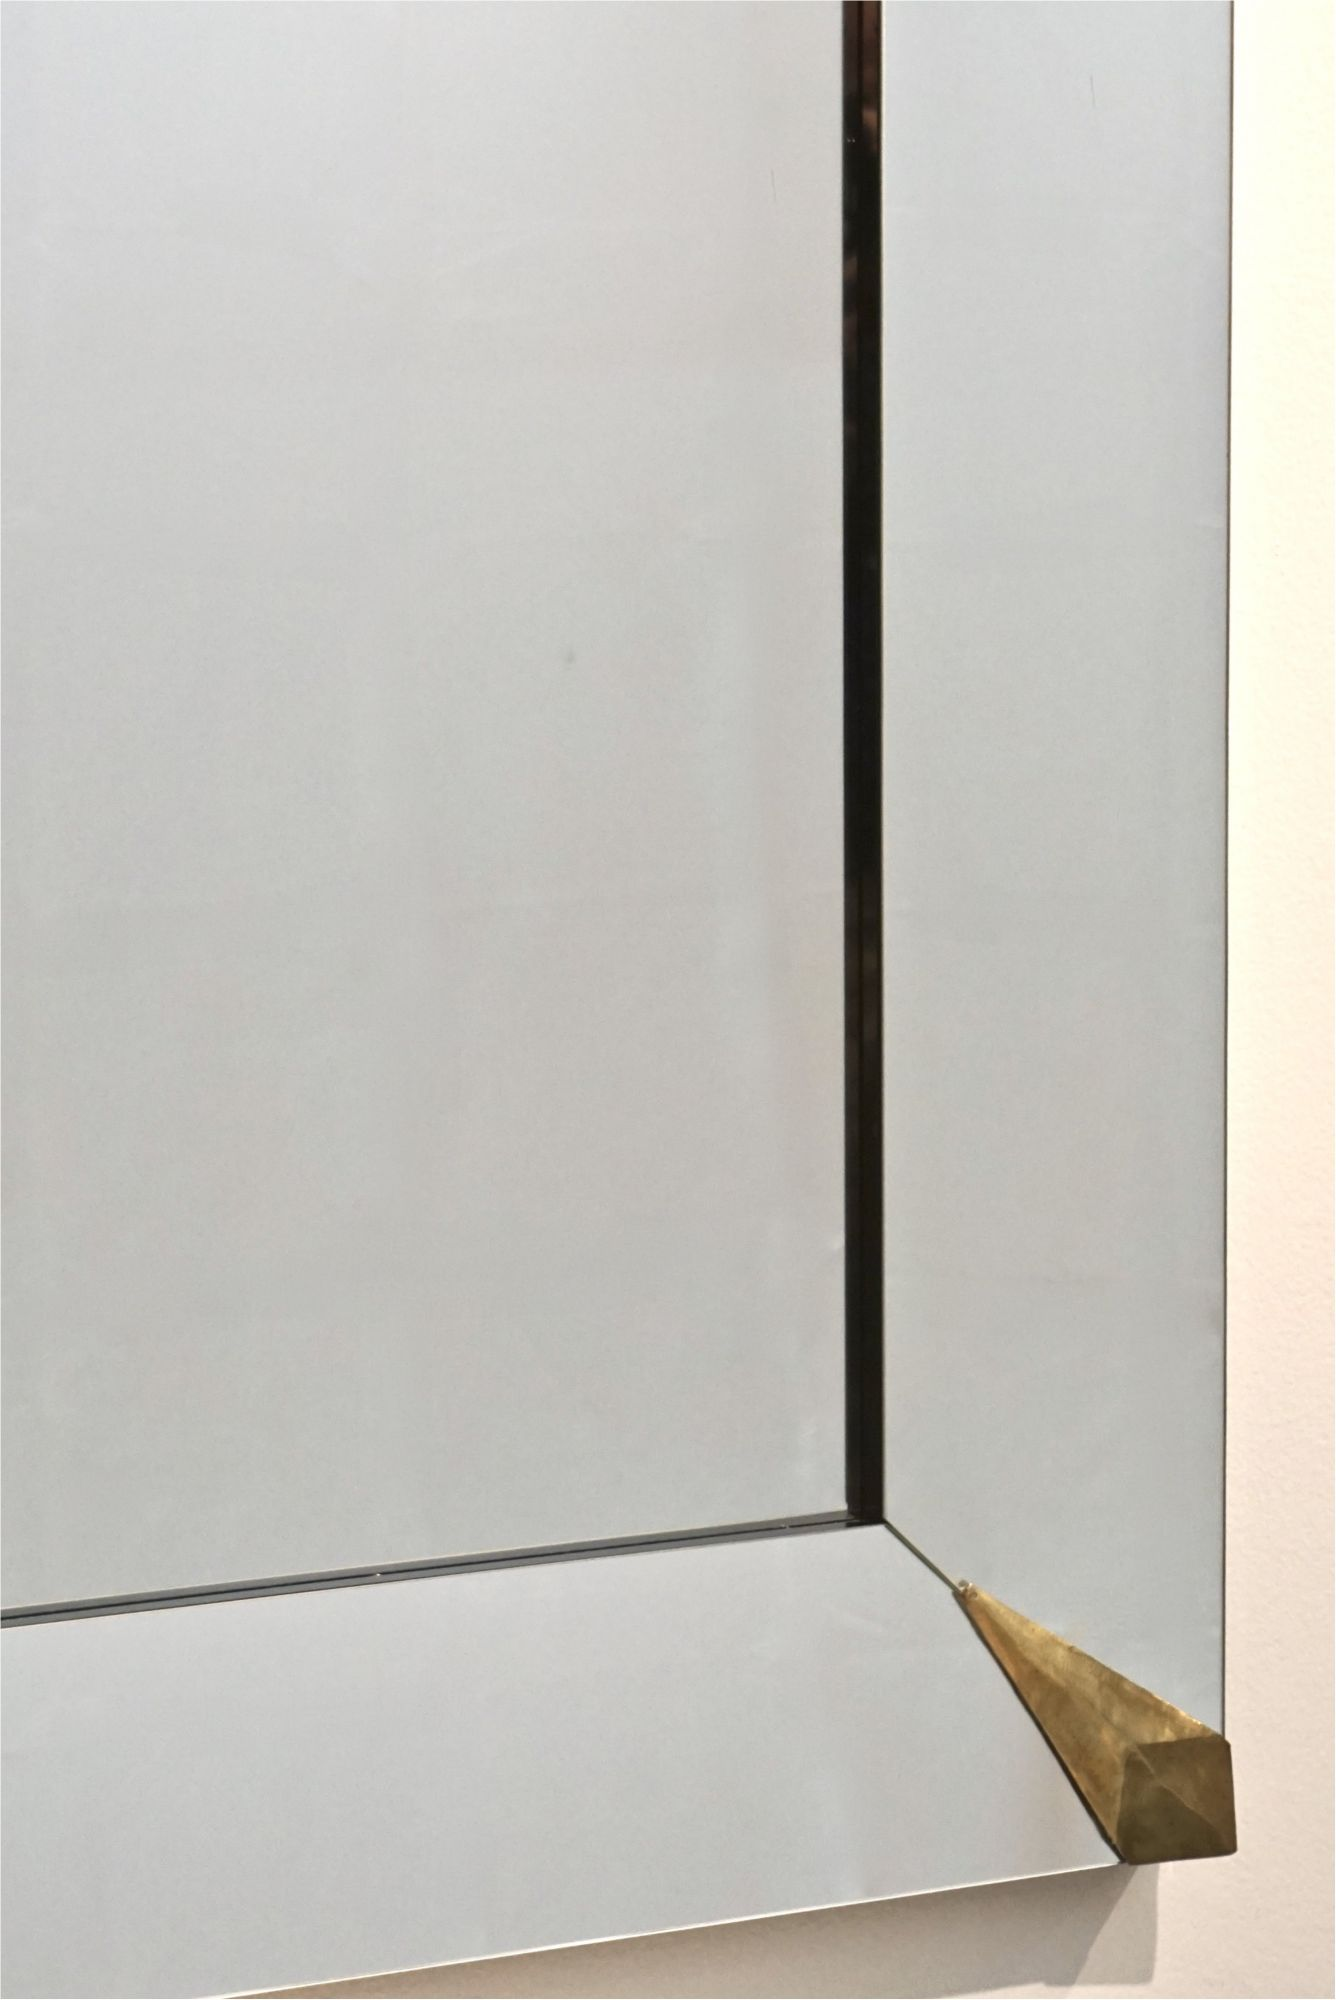 1960s Italian Wall Mirror With Brass Corner Detail